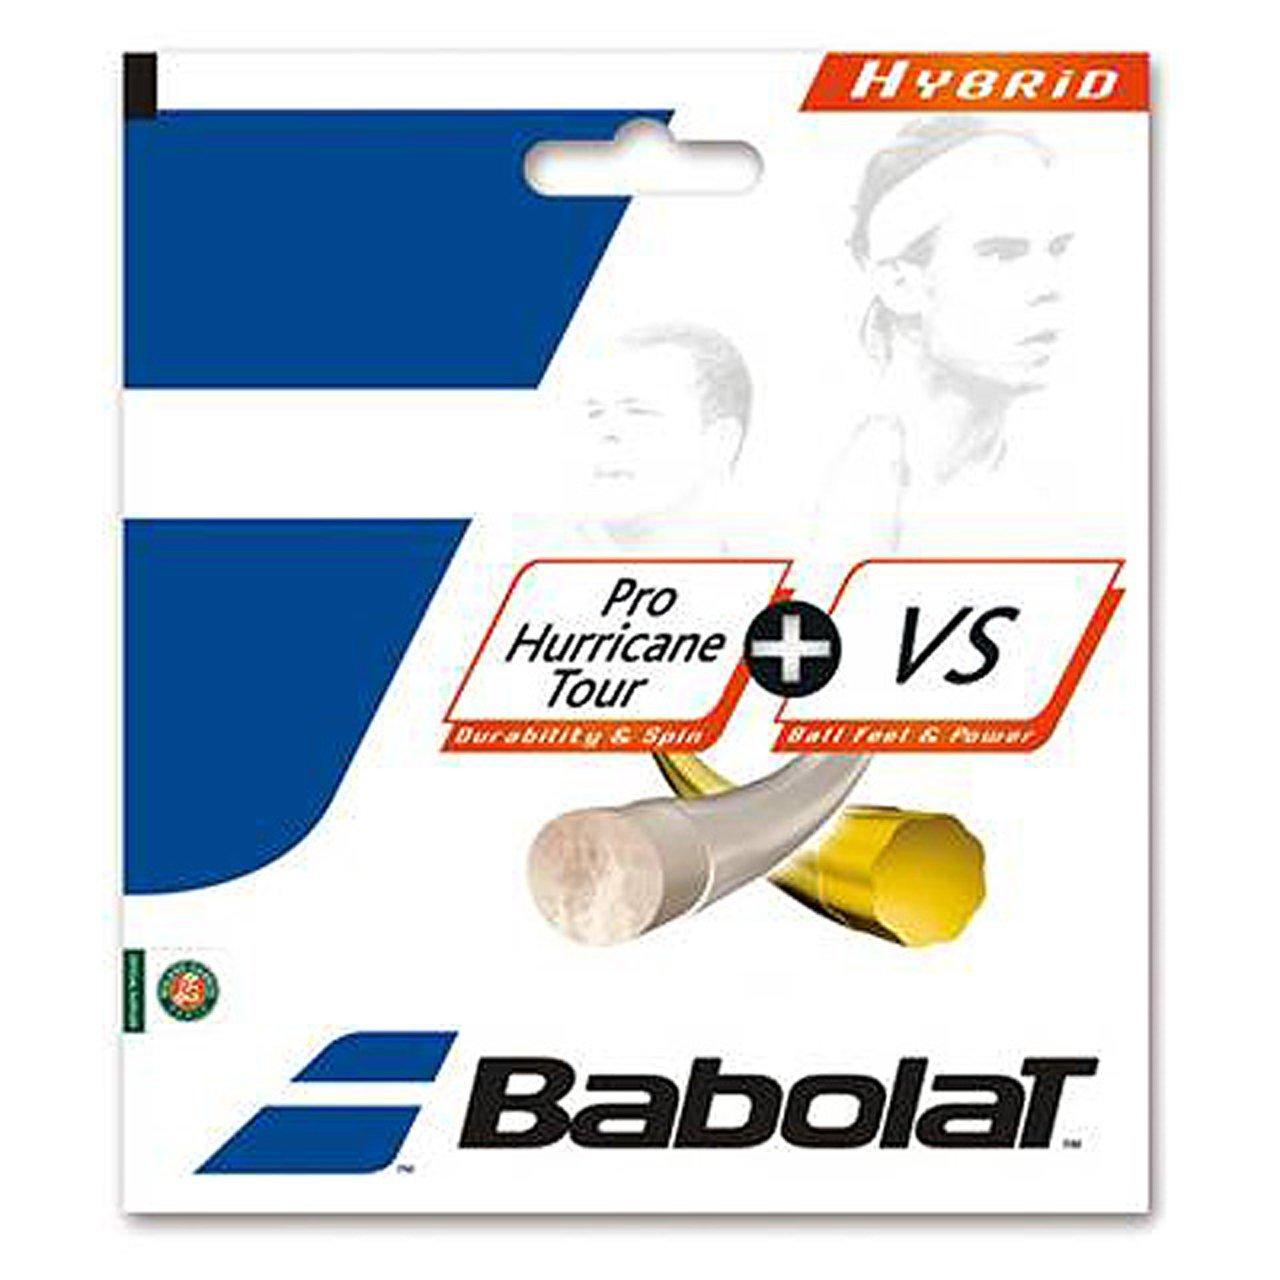 Hybrid Pro Hurricane Tour 125 VS 130 Babolat